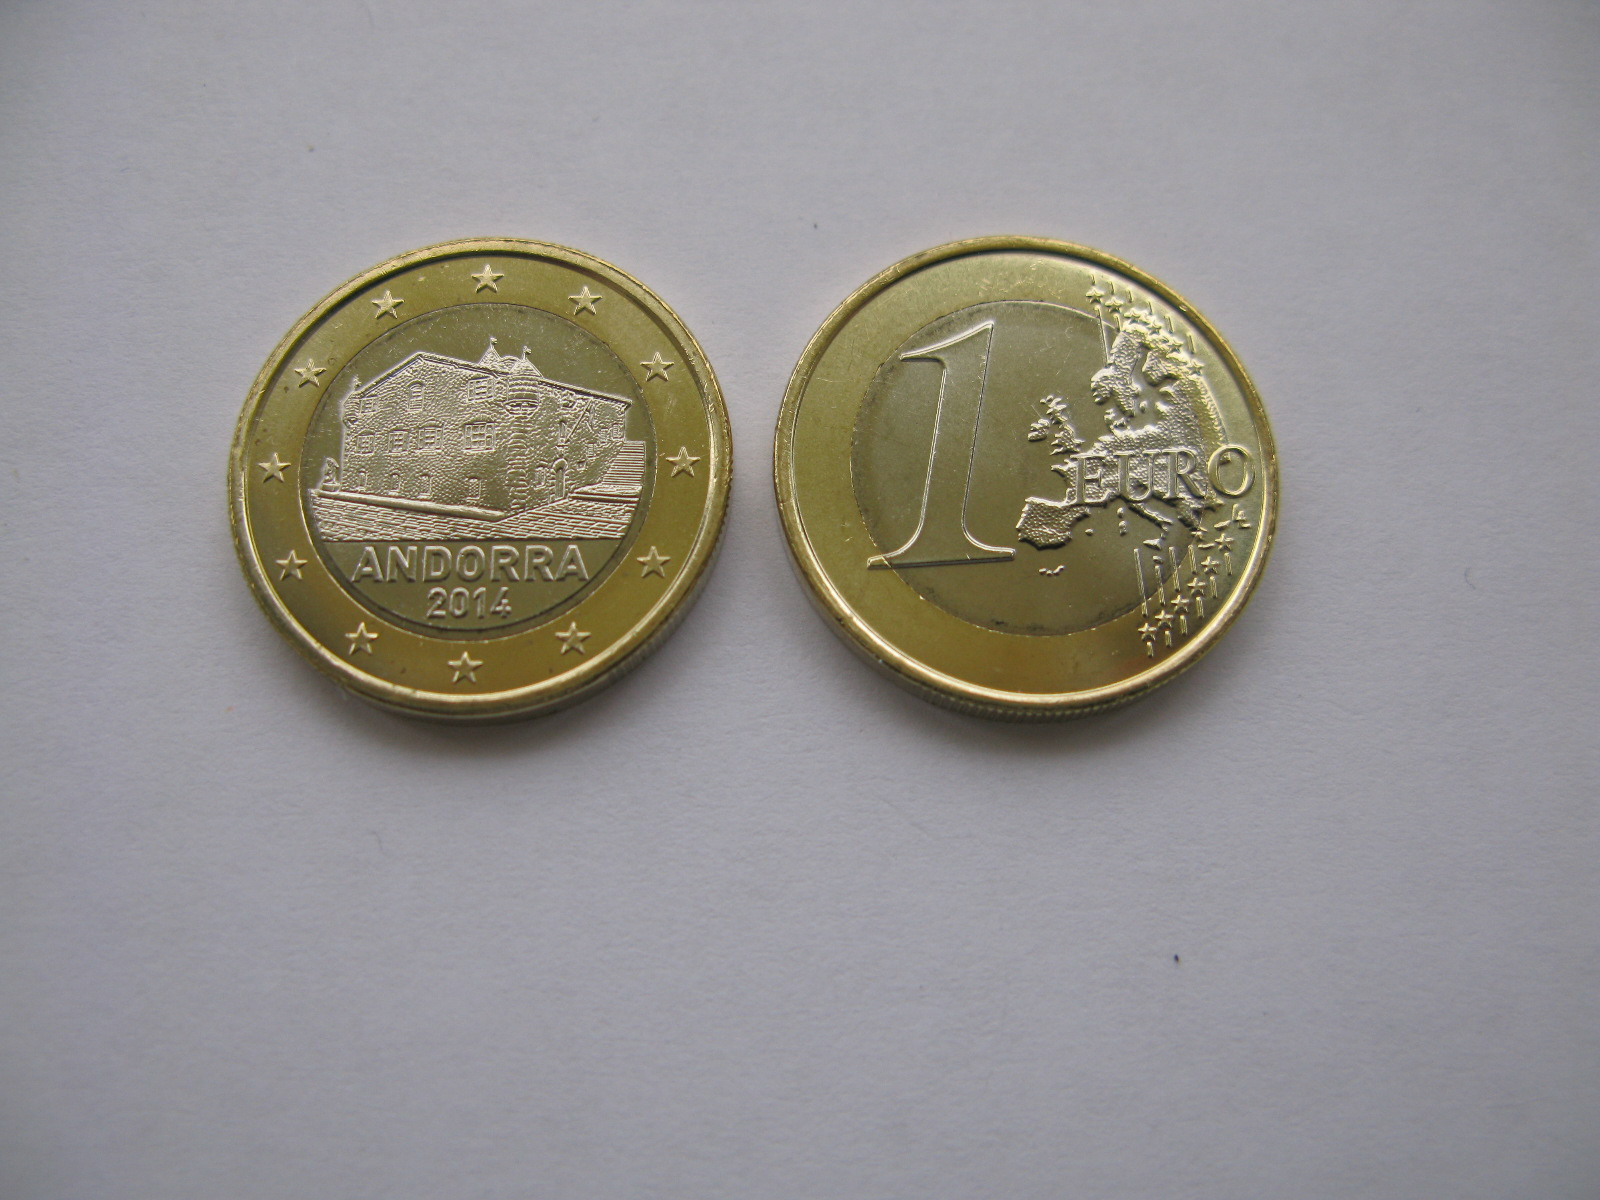 Андорра 1 евро 2014 г.